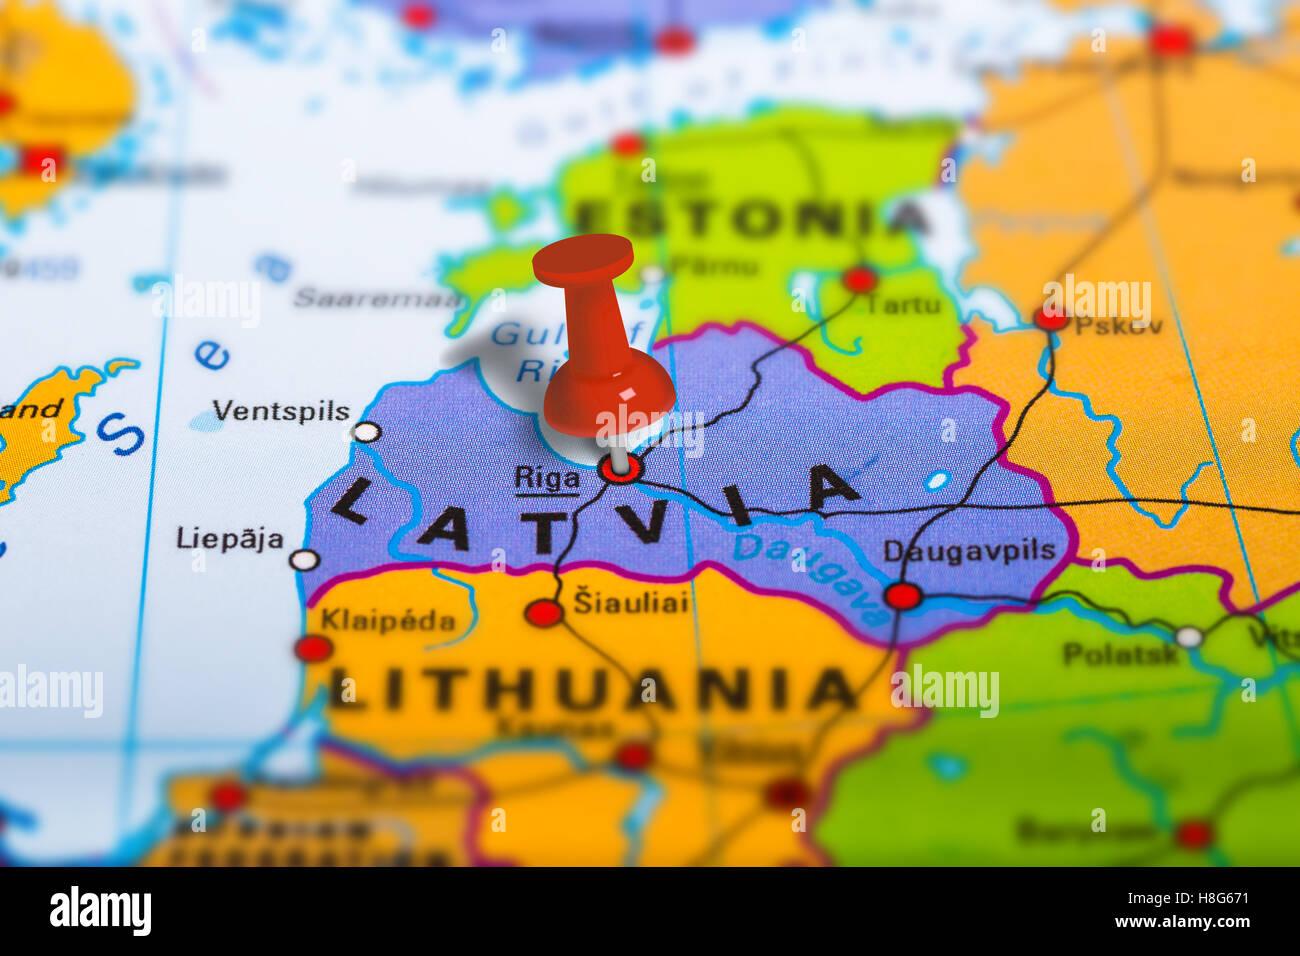 Image of: Riga Latvia Map Stock Photo Alamy